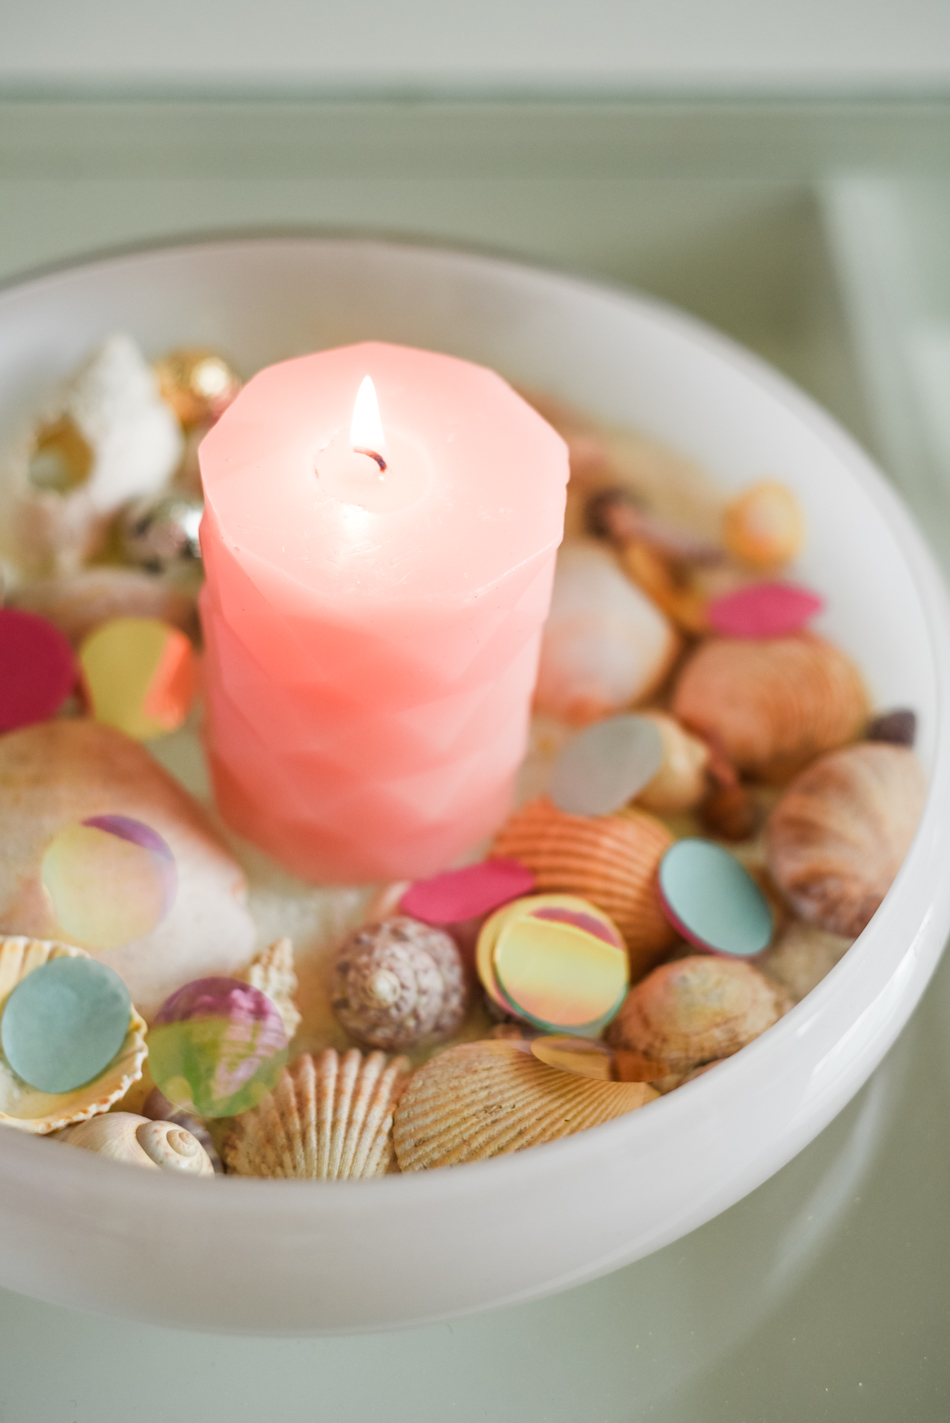 Valentinesday-table-setting-decor-styling-AnaisStoelen-27.jpg